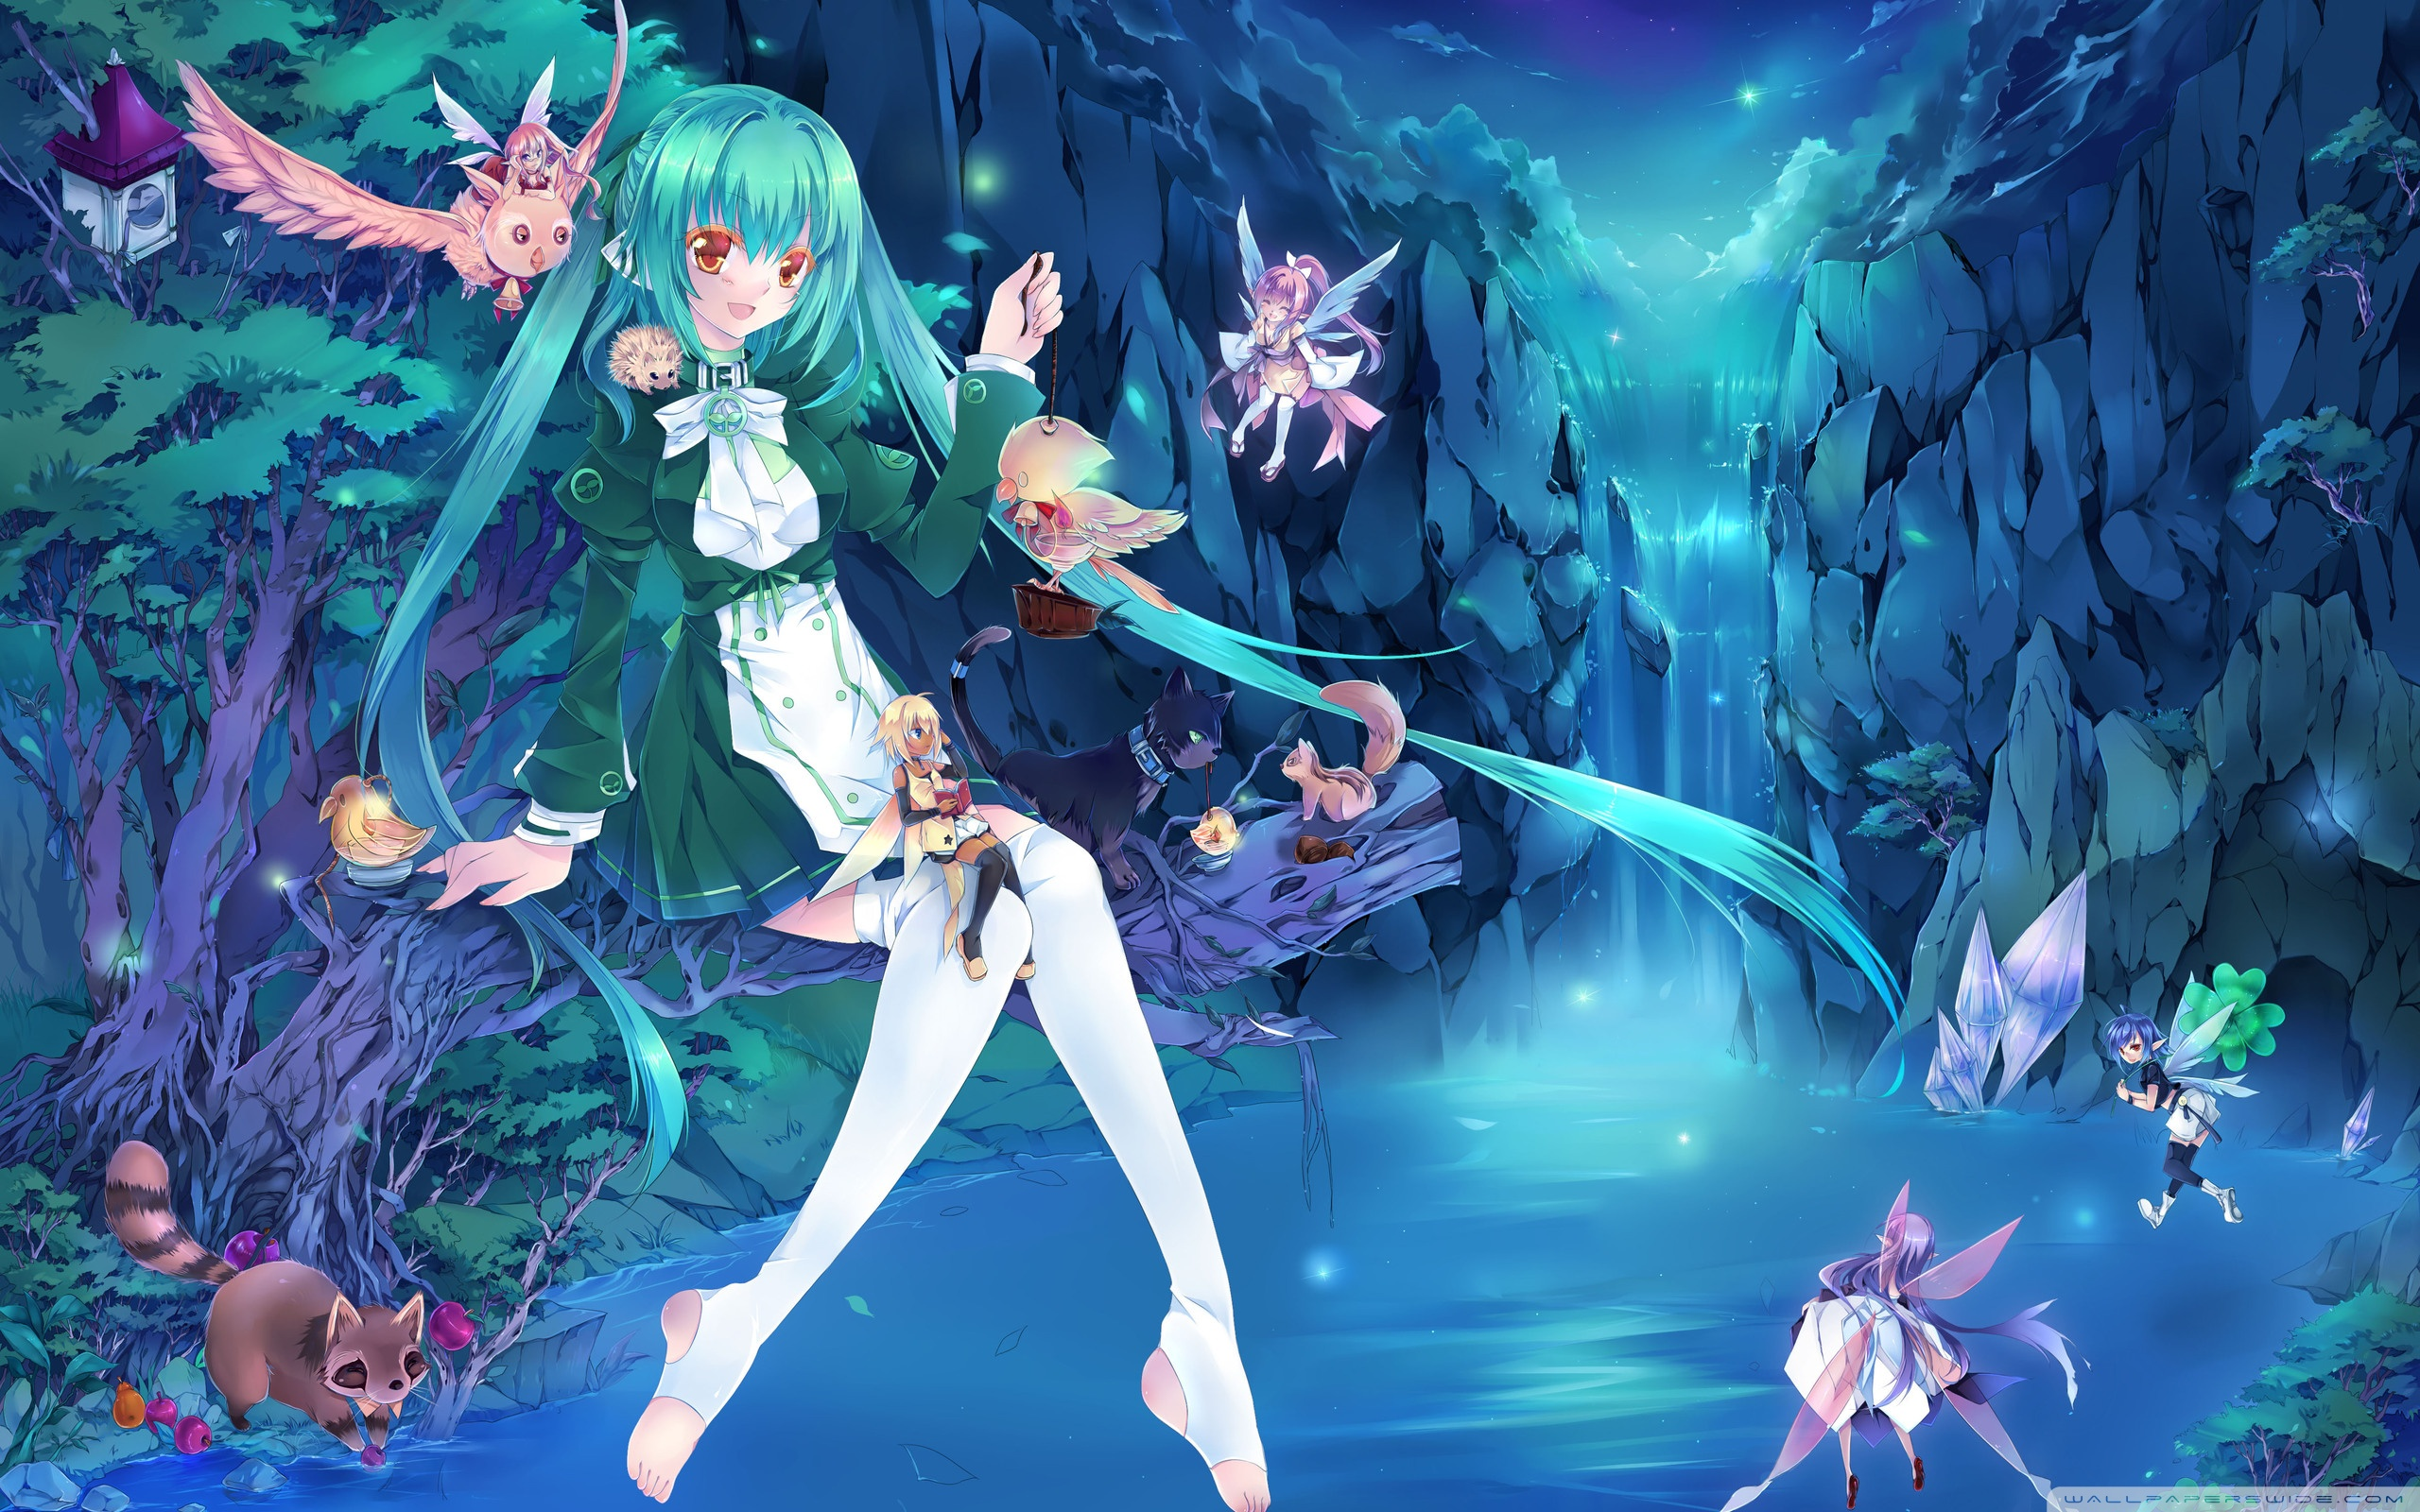 Anime Fairies HD desktop wallpaper : High Definition : Mobile